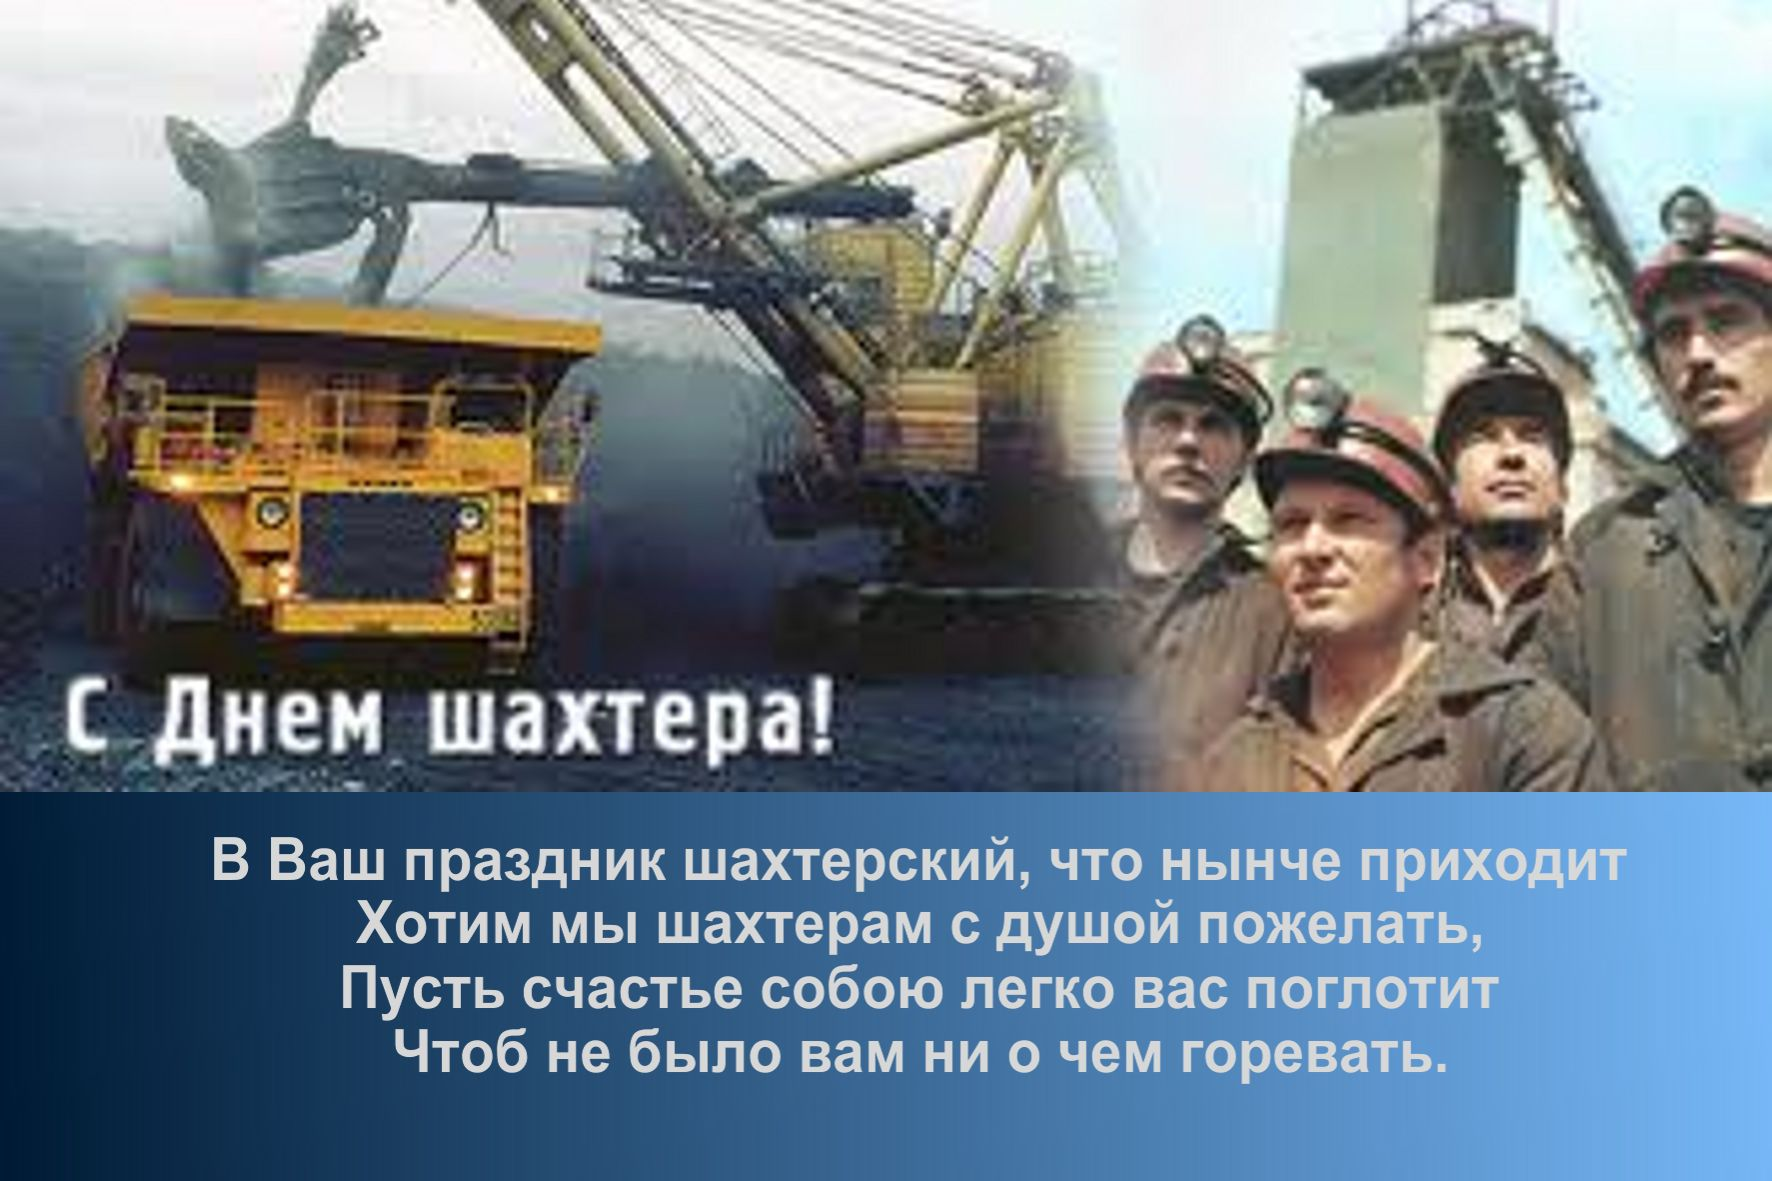 Поздравление шахтёров с днём шахтёра 56